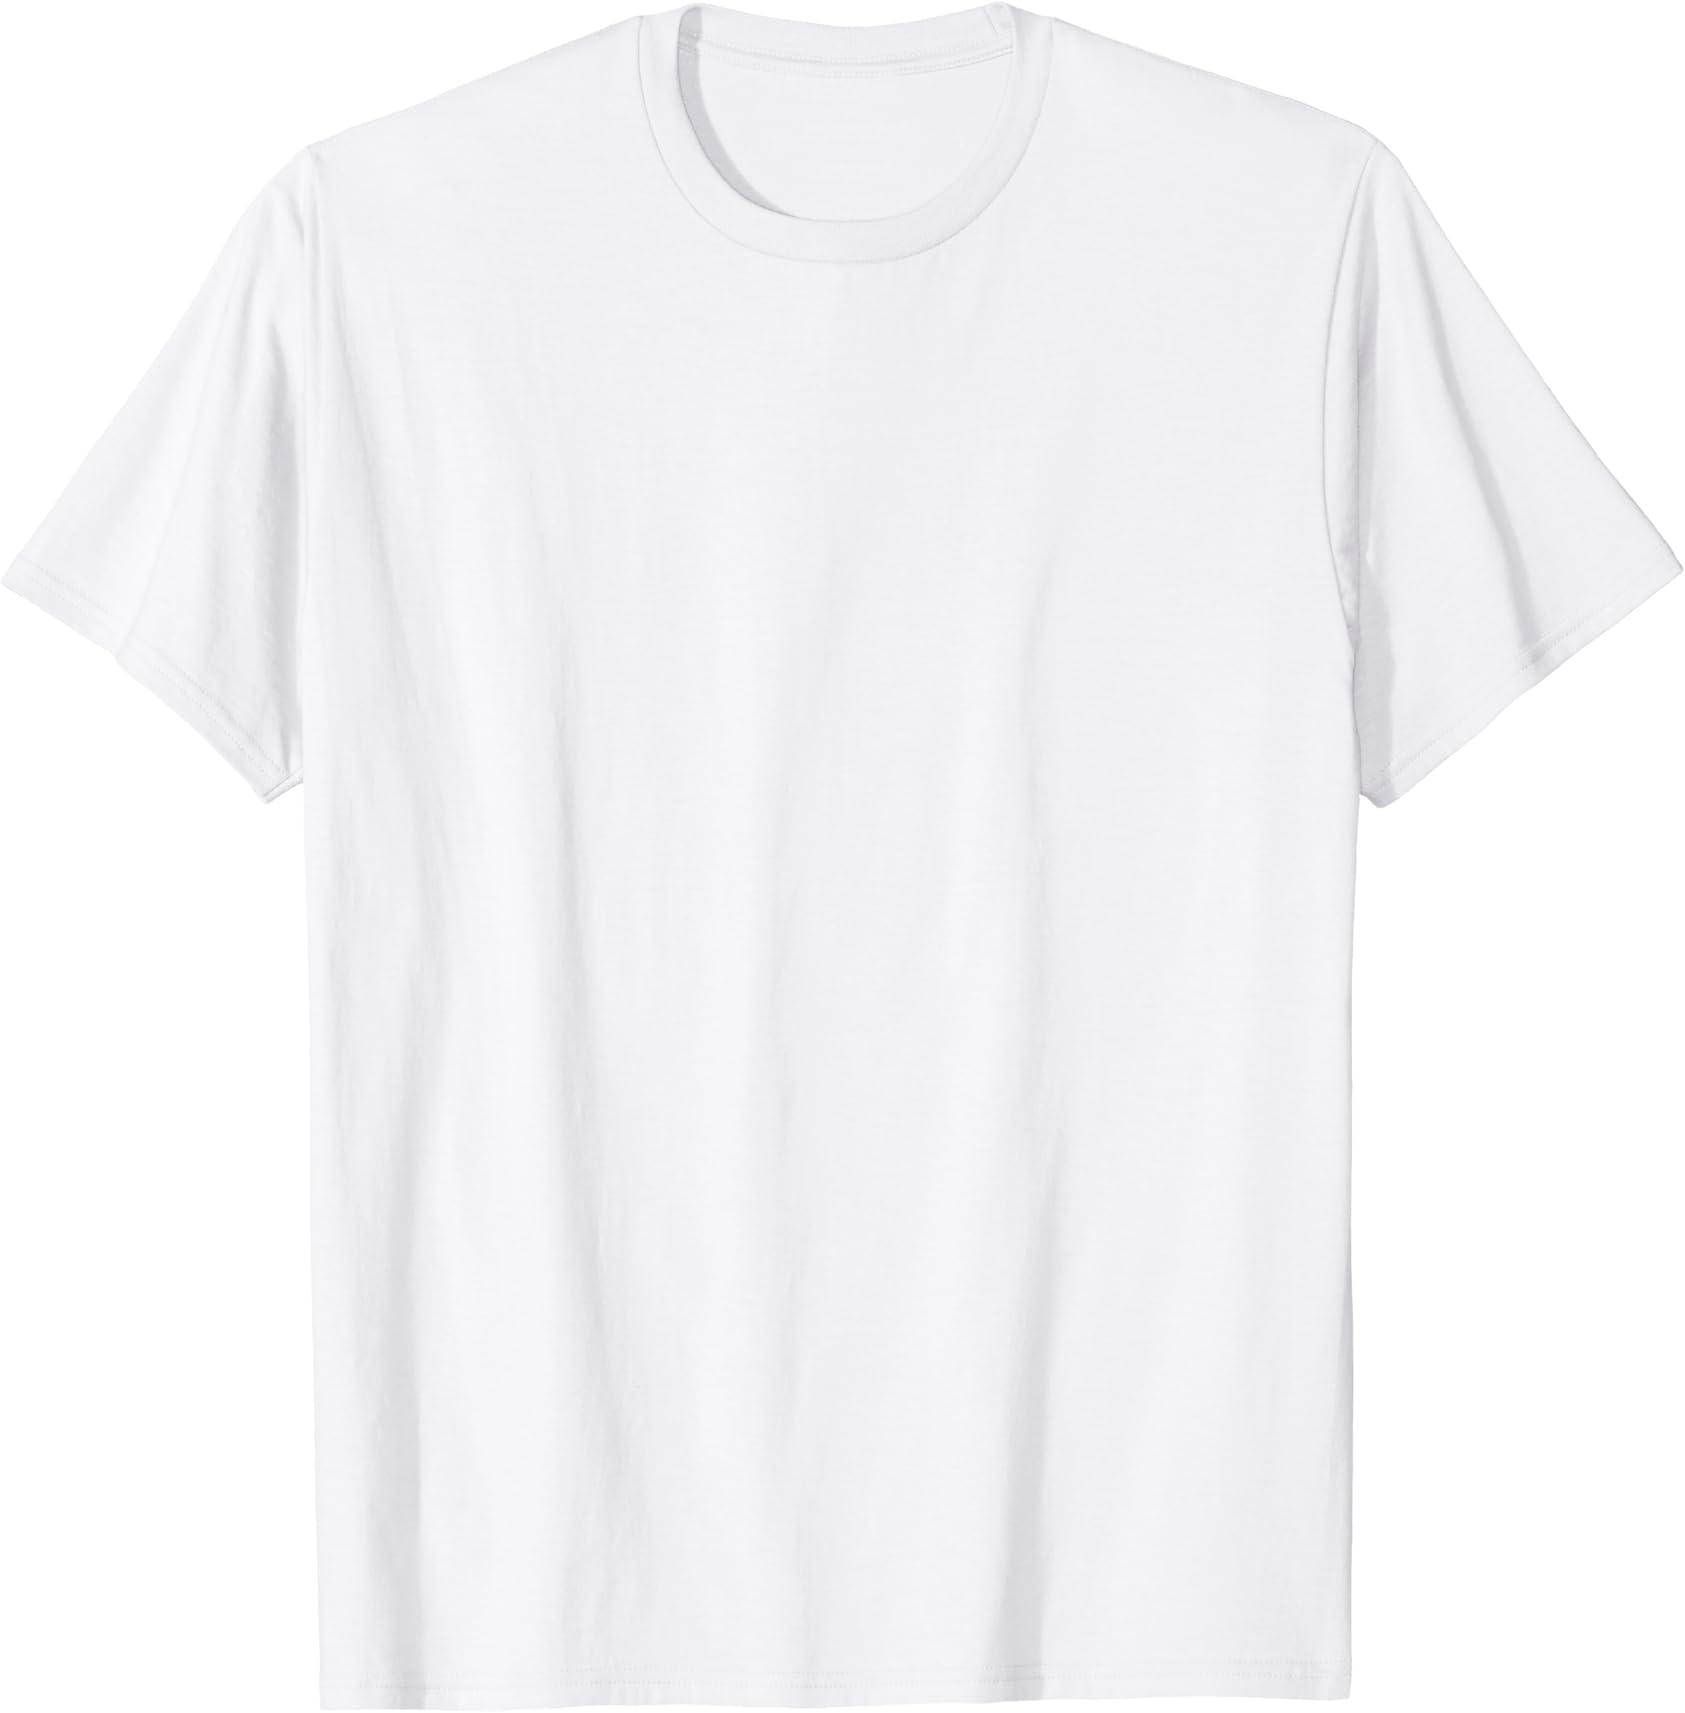 UFO Get In Loser We/'re Doing Butt Stuff Funny T-Shirt Men Sport Grey Cotton Tee